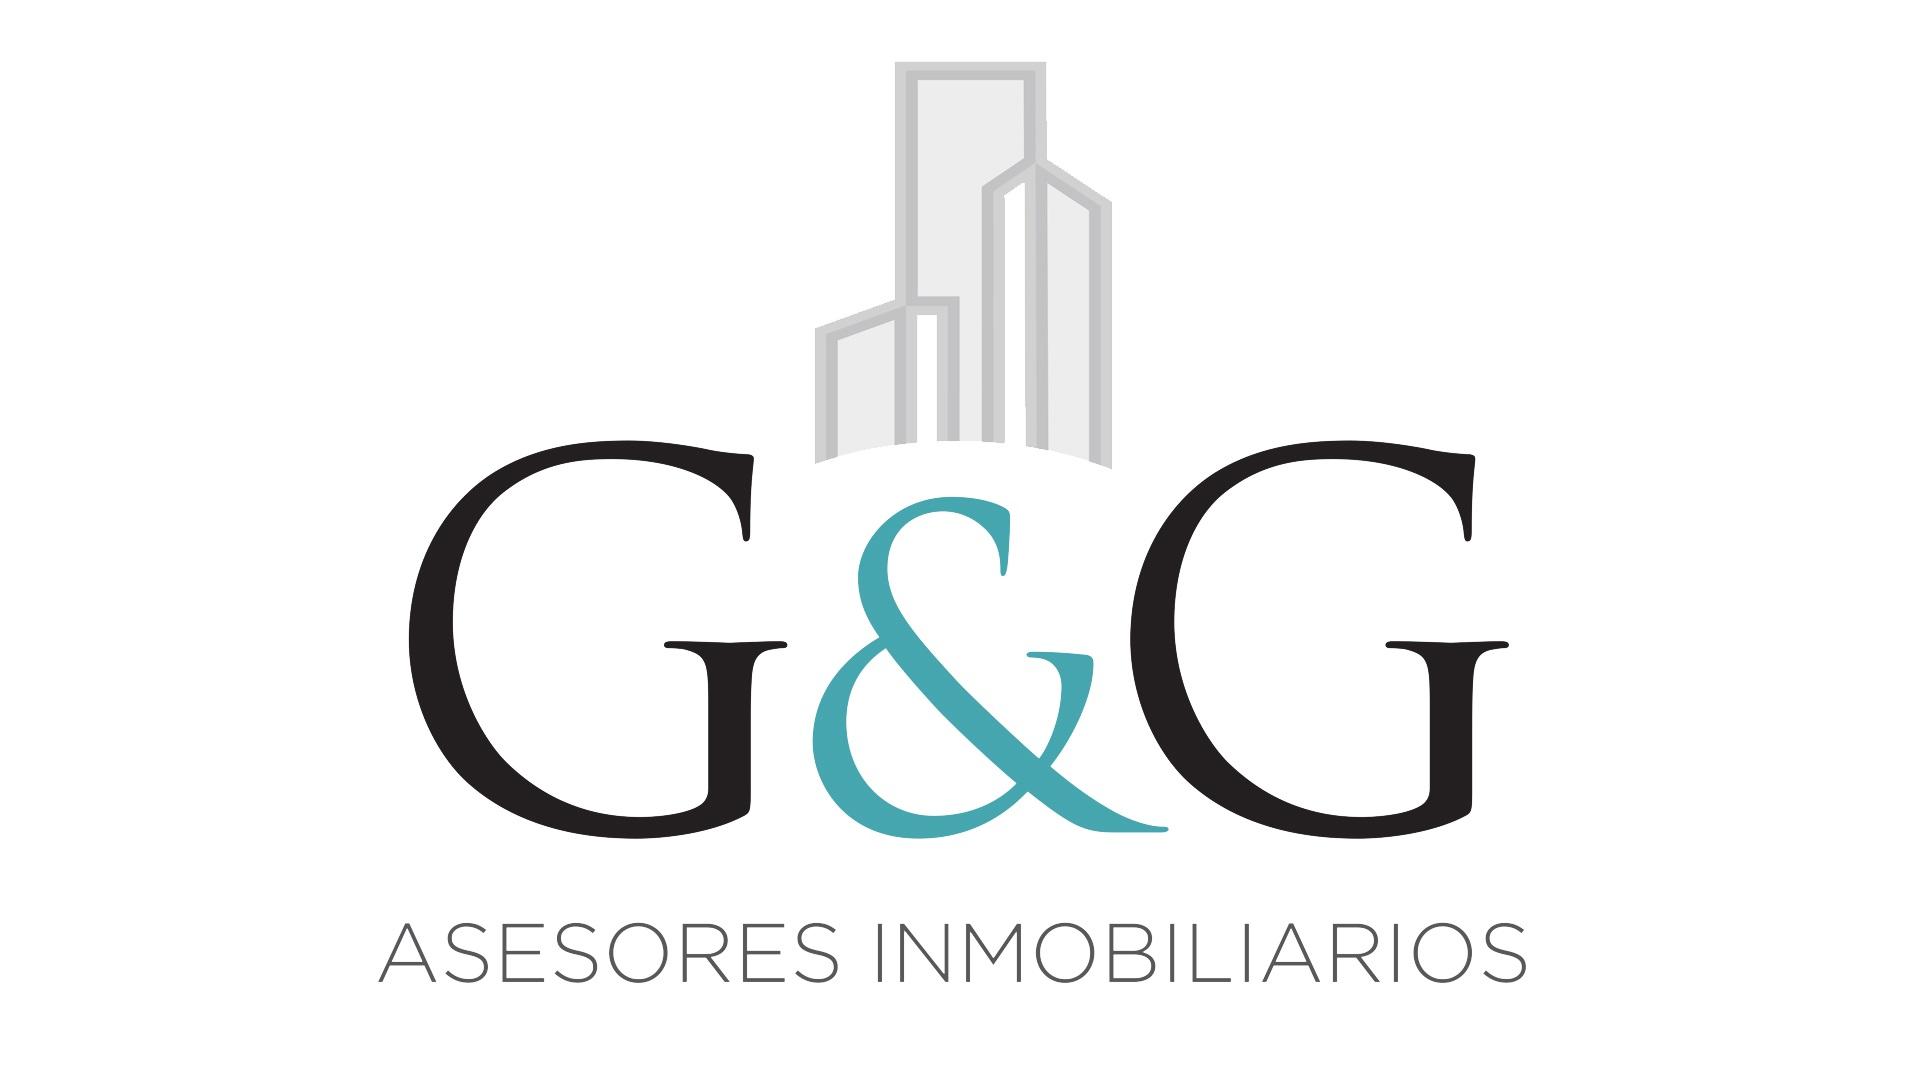 G&G Asesores Inmobiliarios